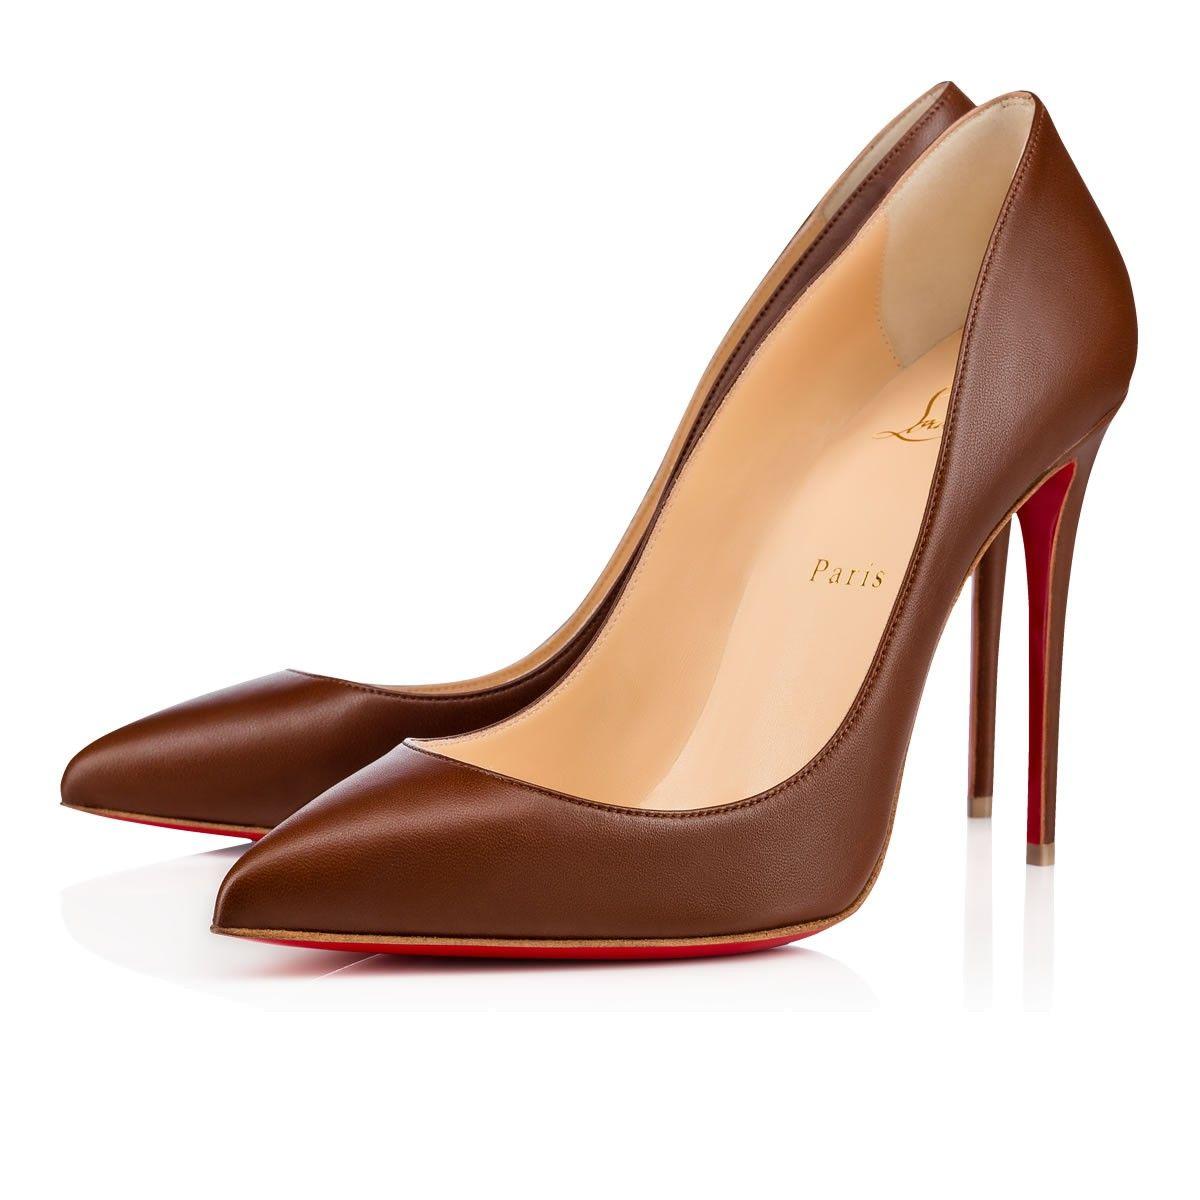 "Shoes - Pigalle Follies ""ada"" N°6 - Christian Louboutin"